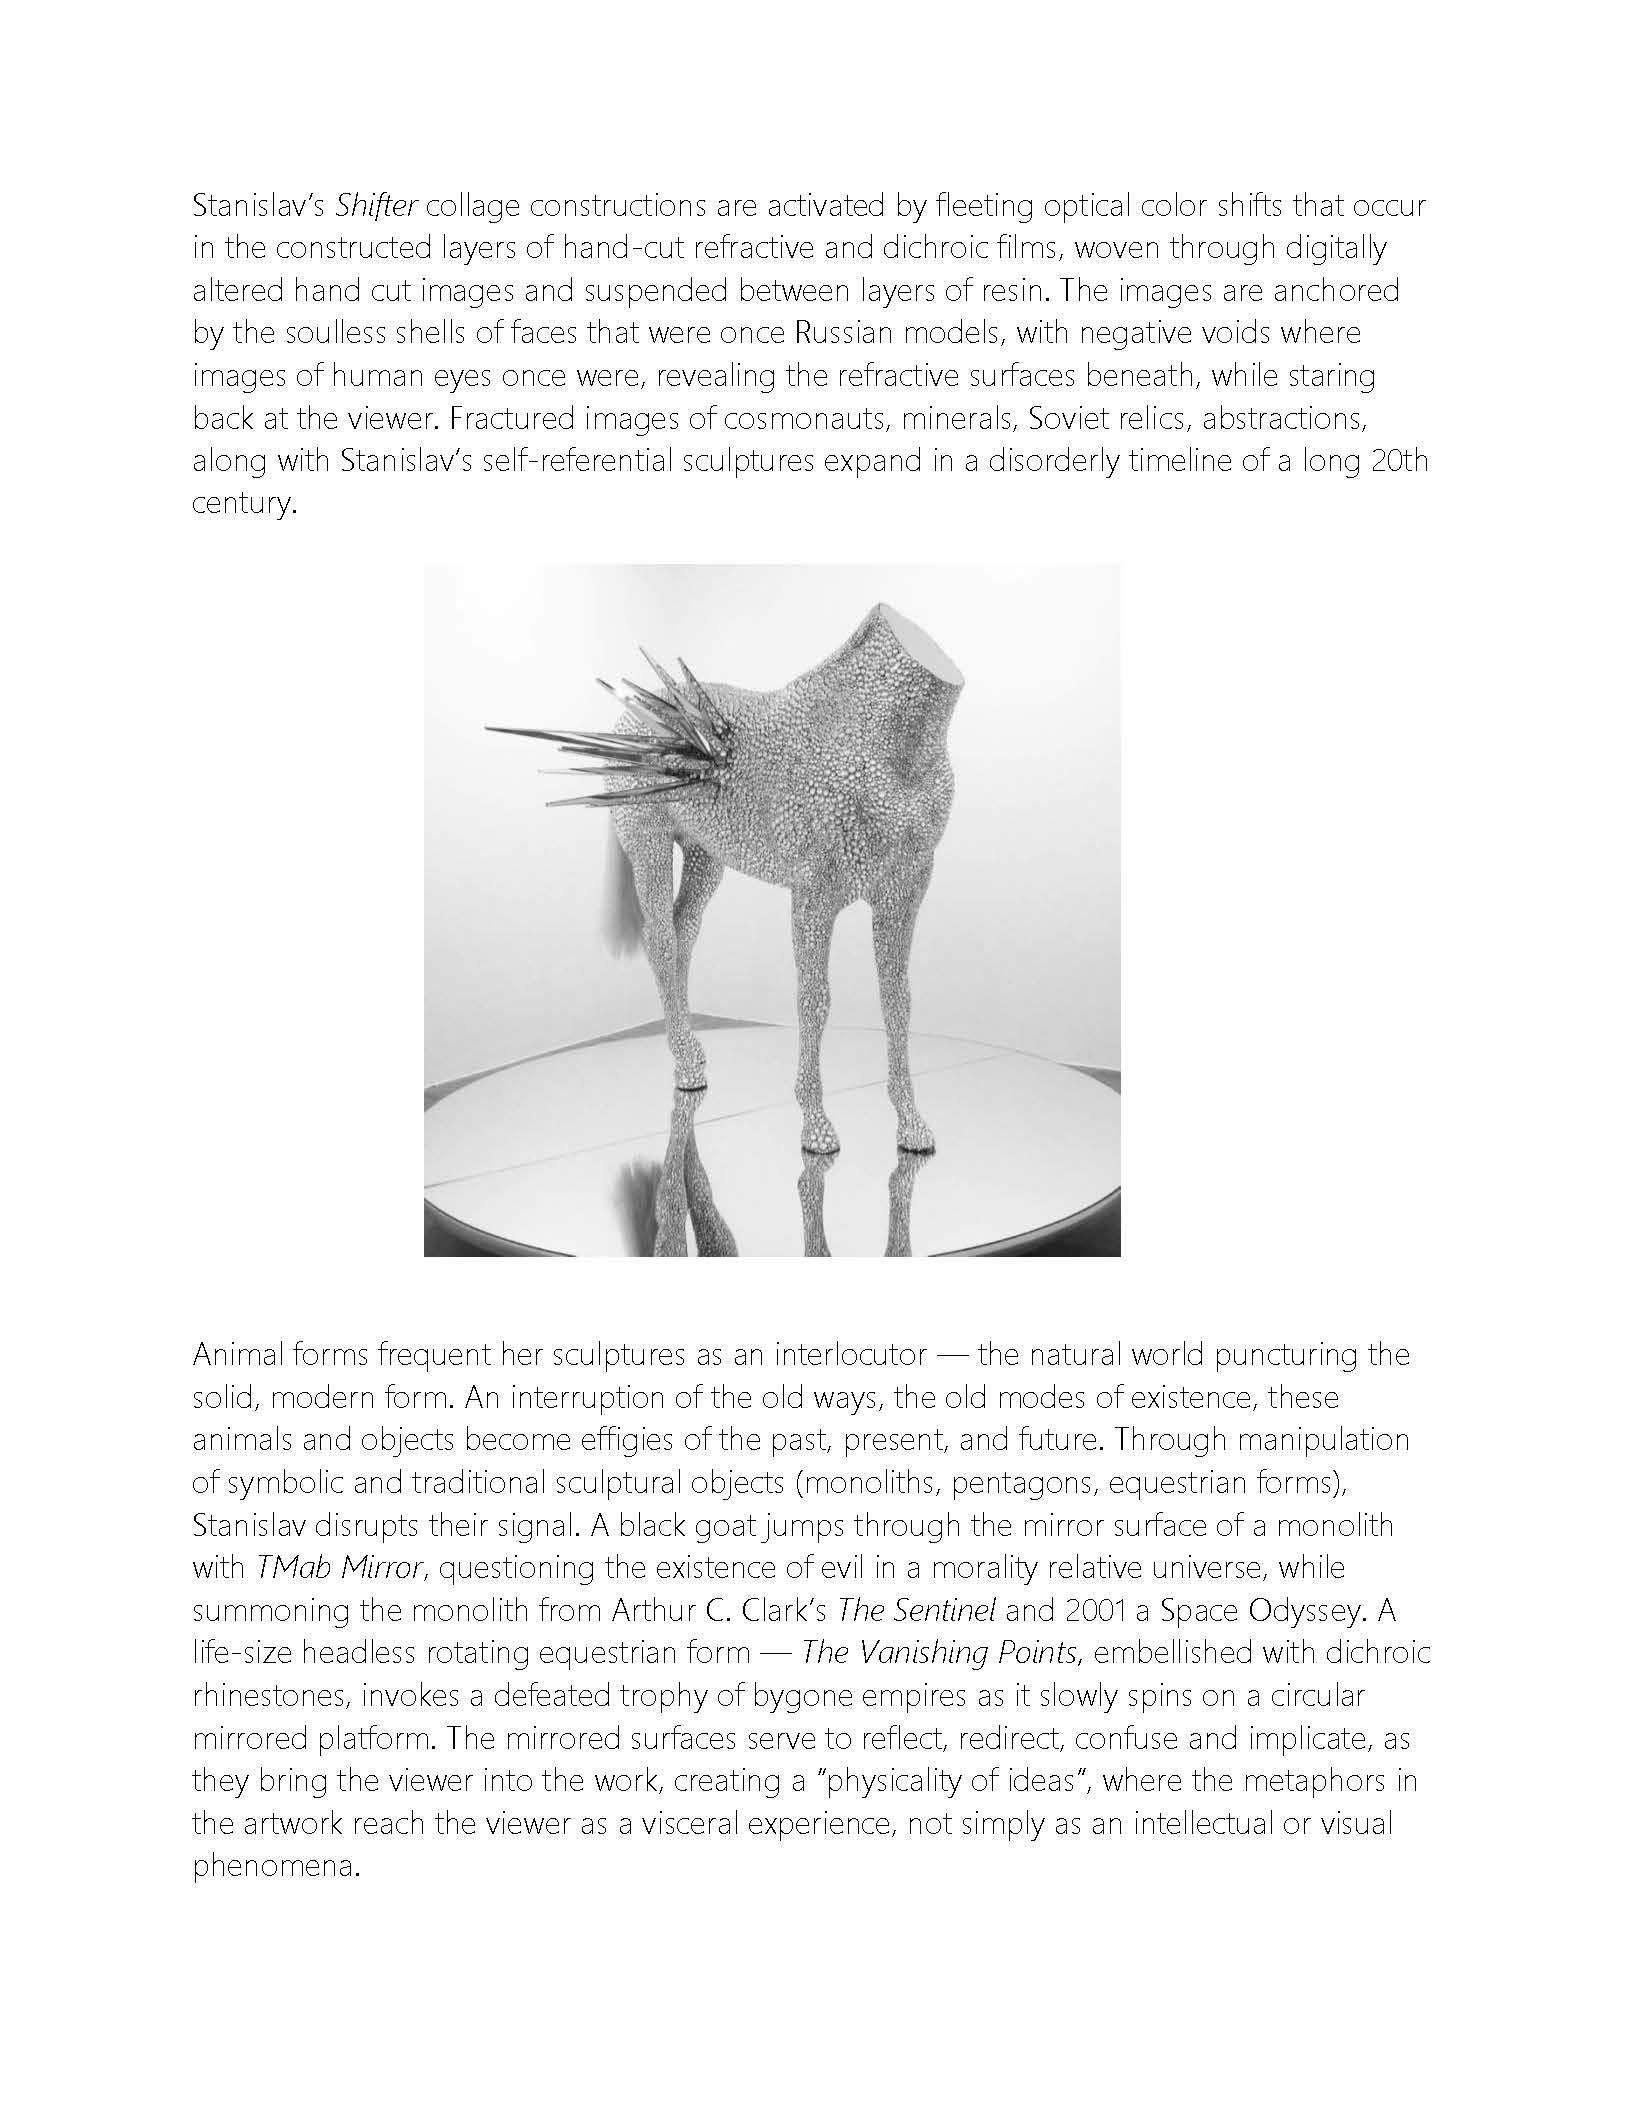 PR_Stanislav_v5_Bruno-David-Gallery_11-2017_Page_3.jpg